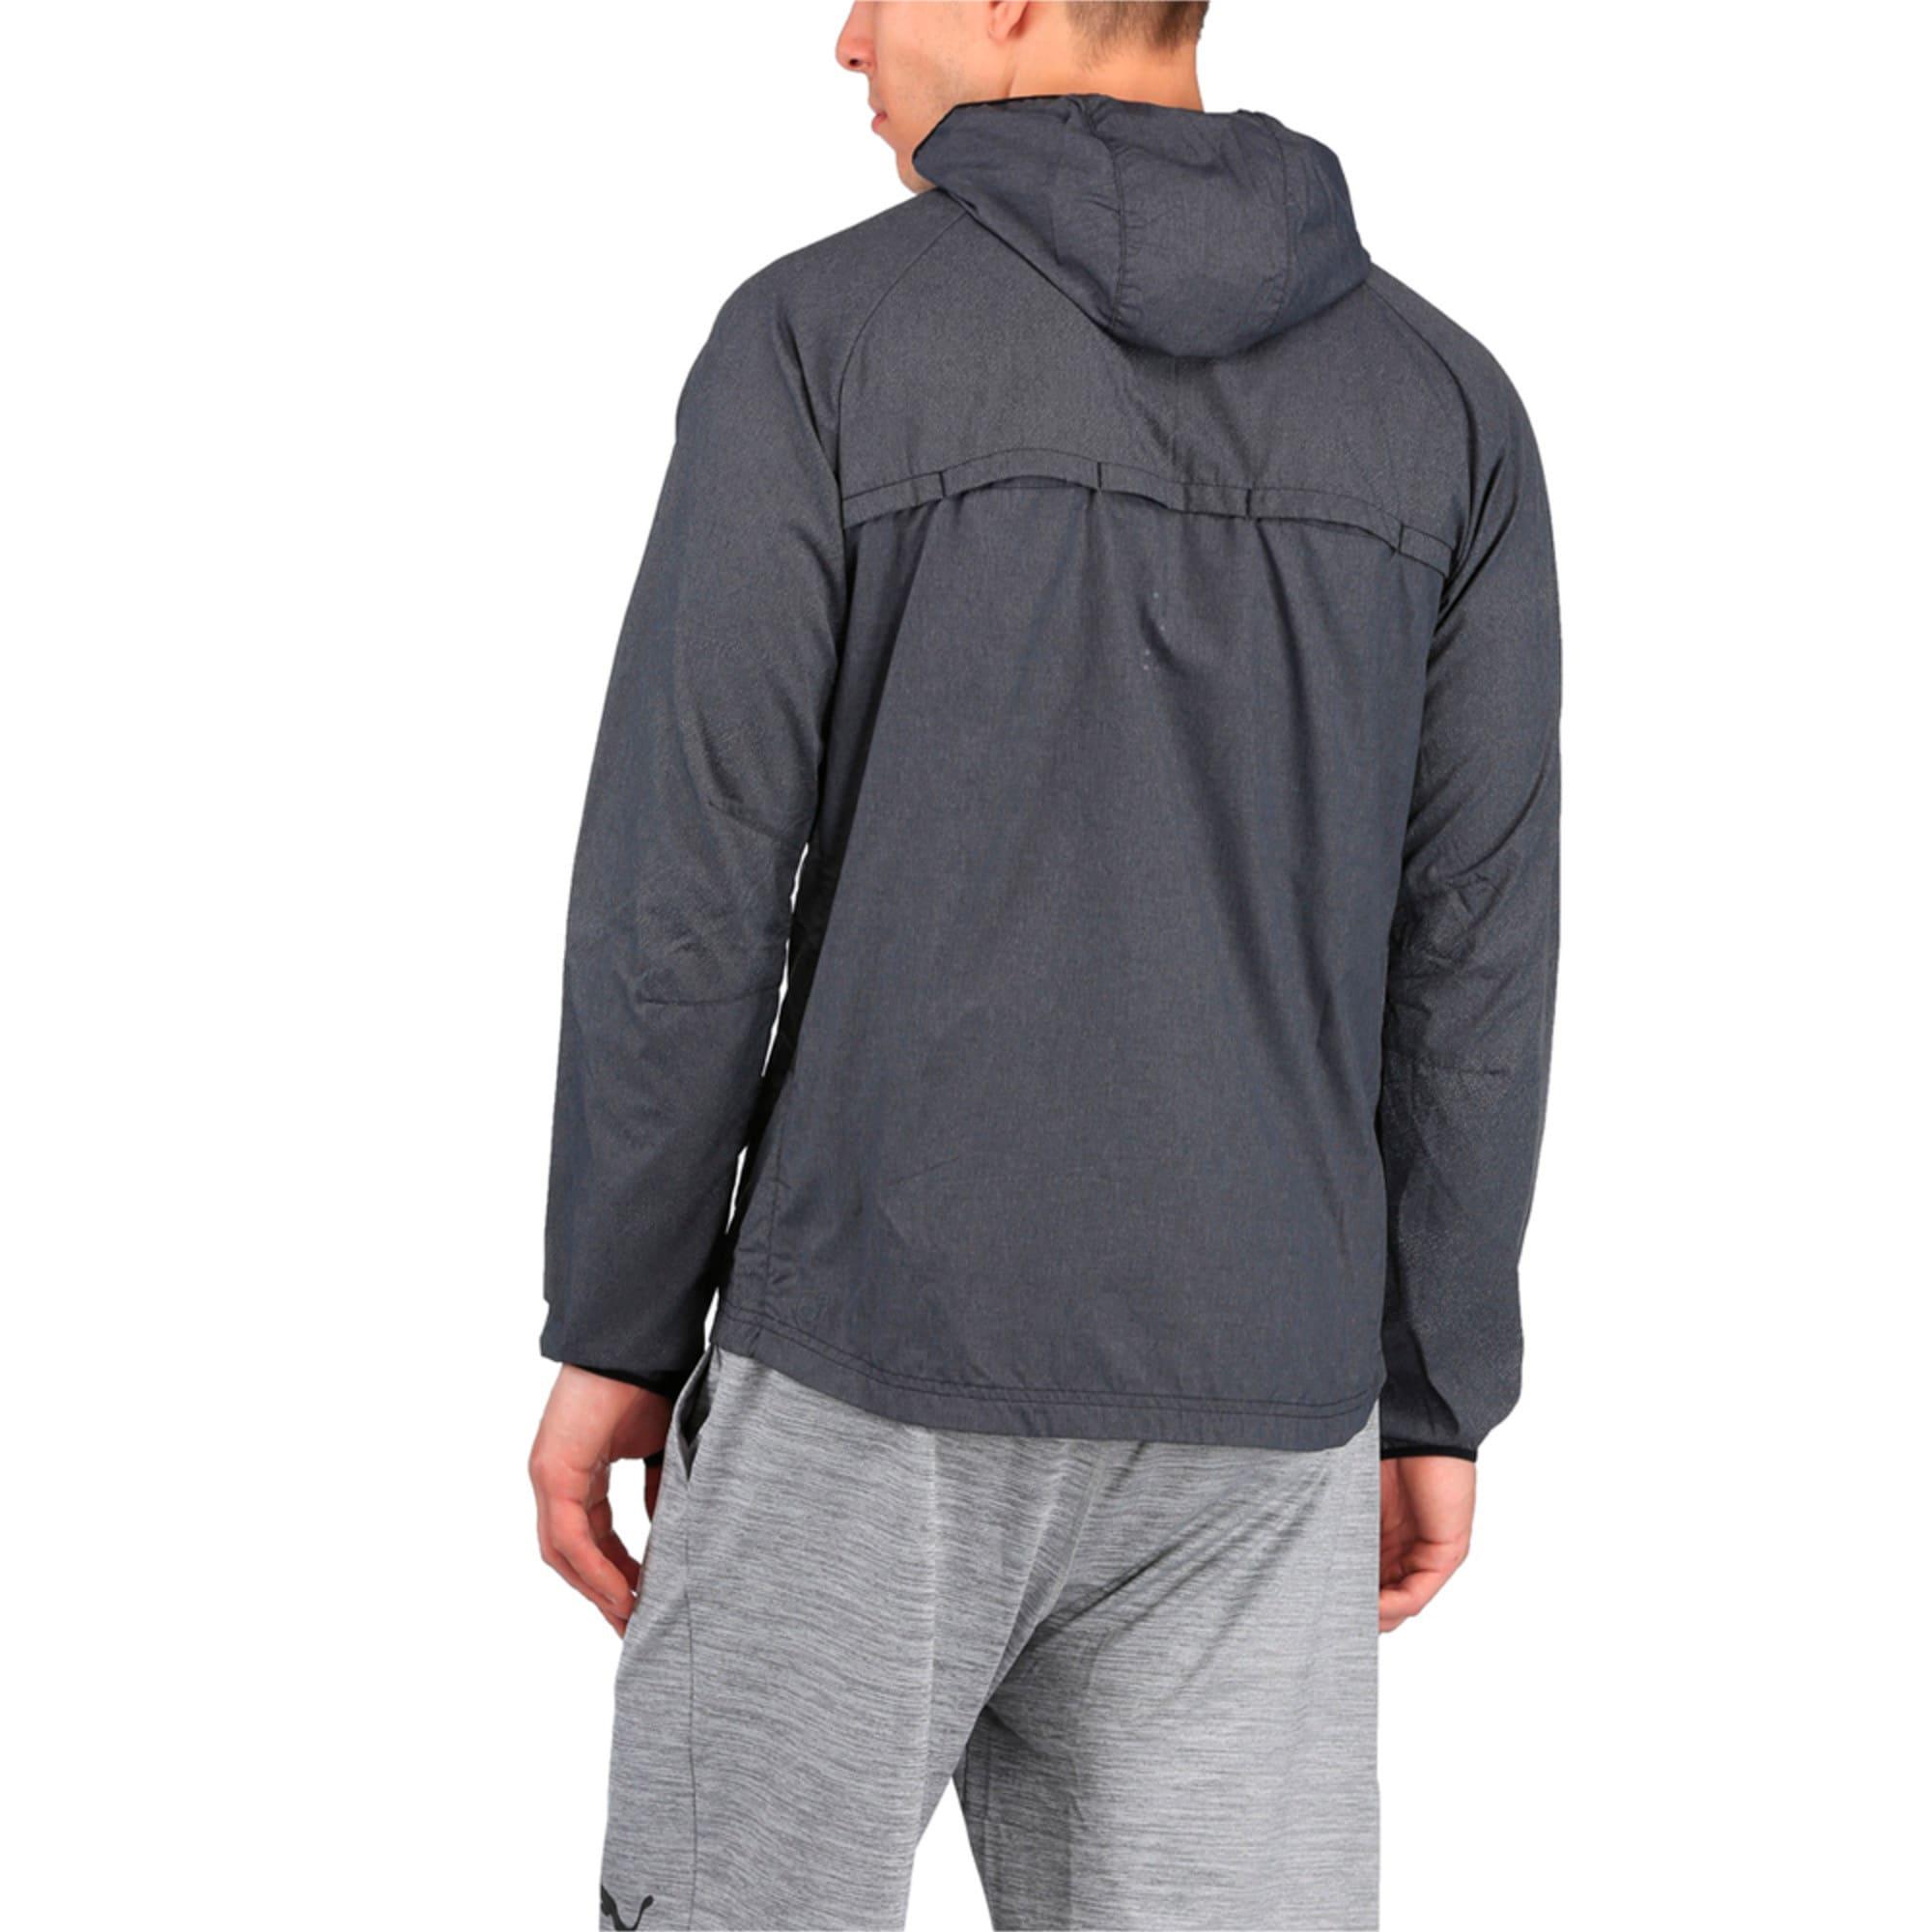 Thumbnail 1 of Running Men's NightCat Jacket, Puma Black Heather, medium-IND